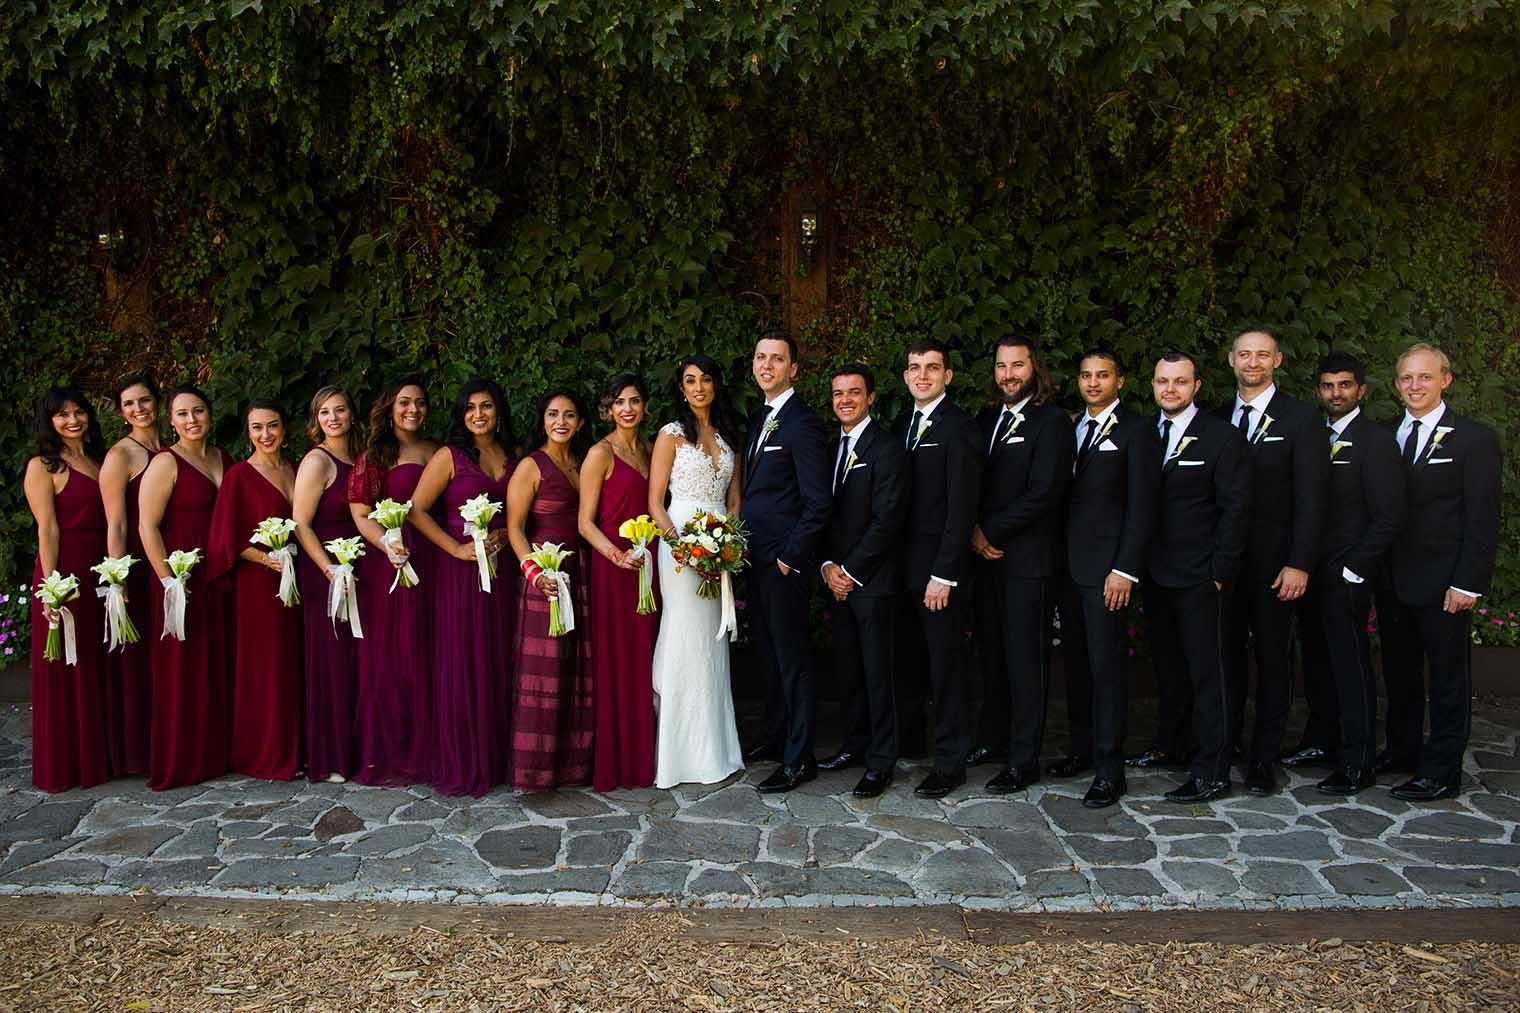 V. Sattui Winery Wedding Bridal Party